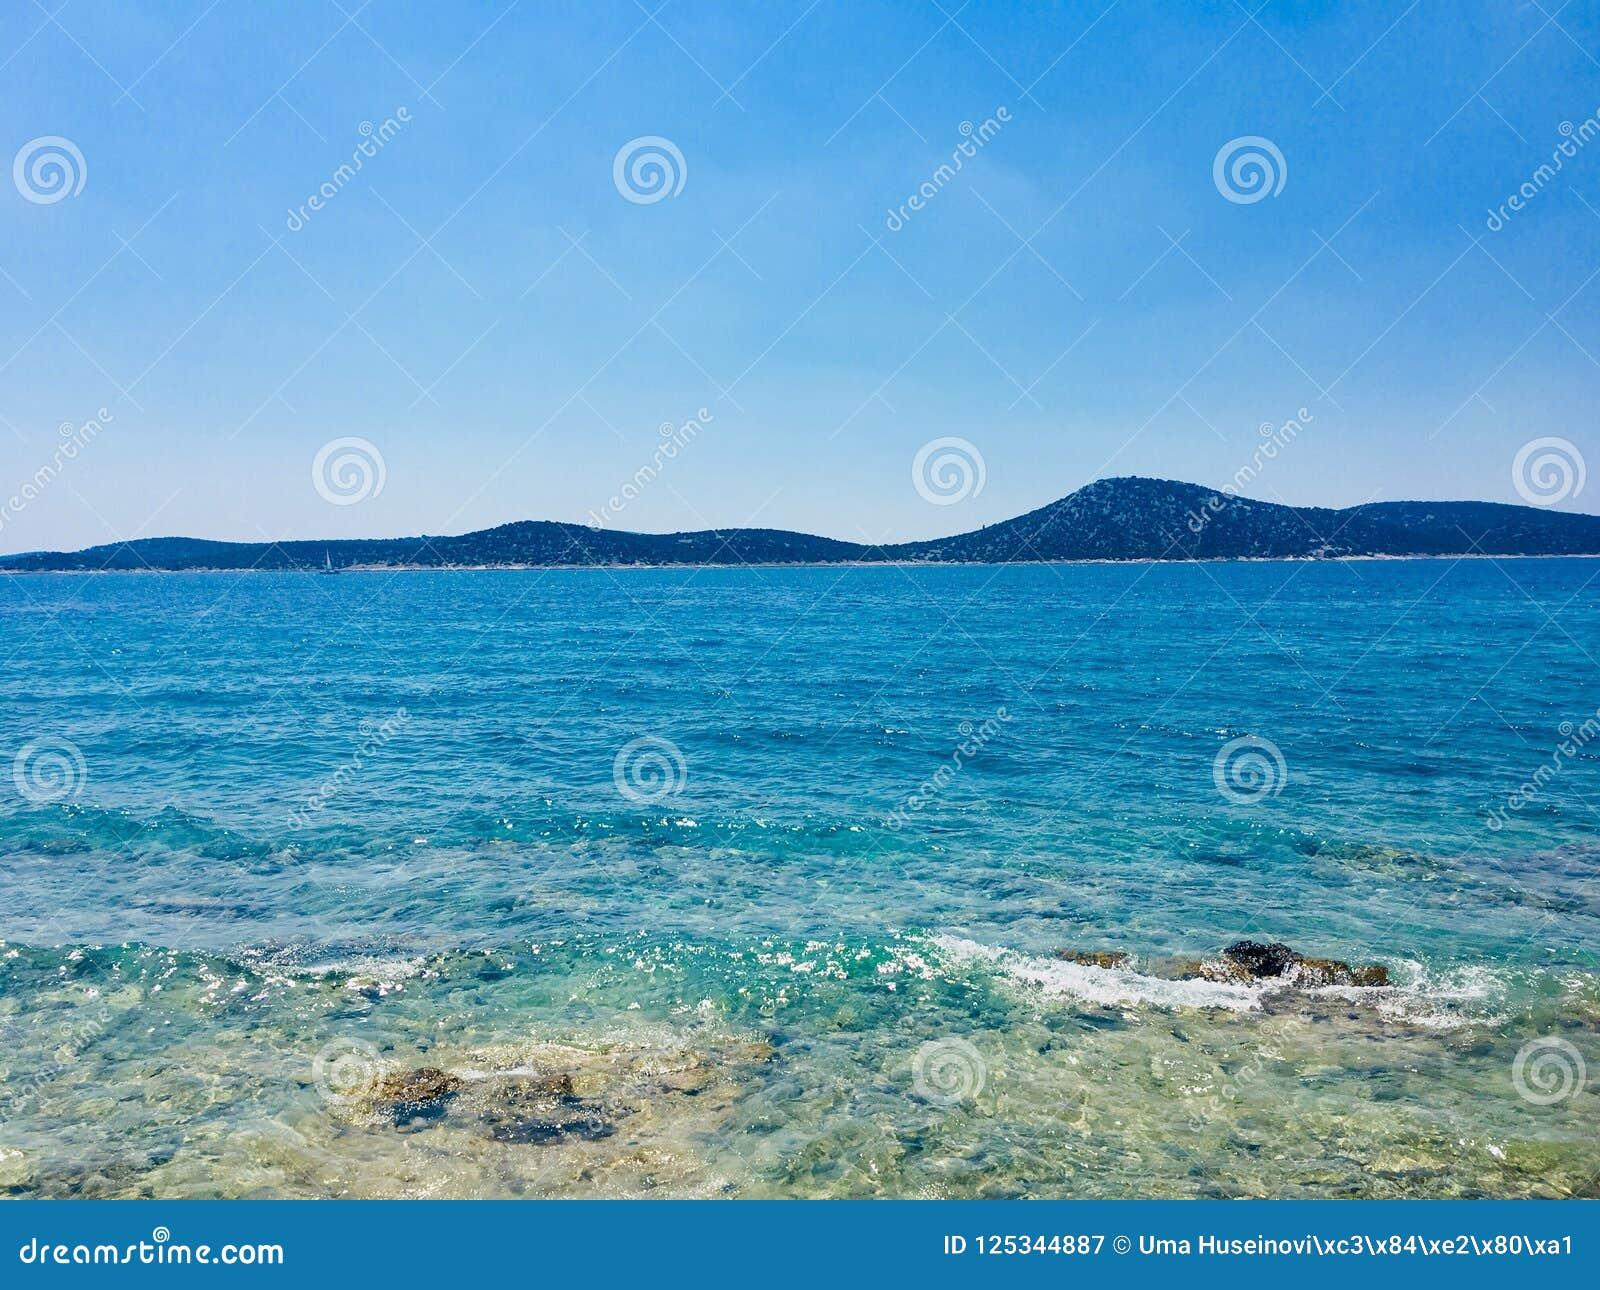 Sunny Summer Adriatic Sea View